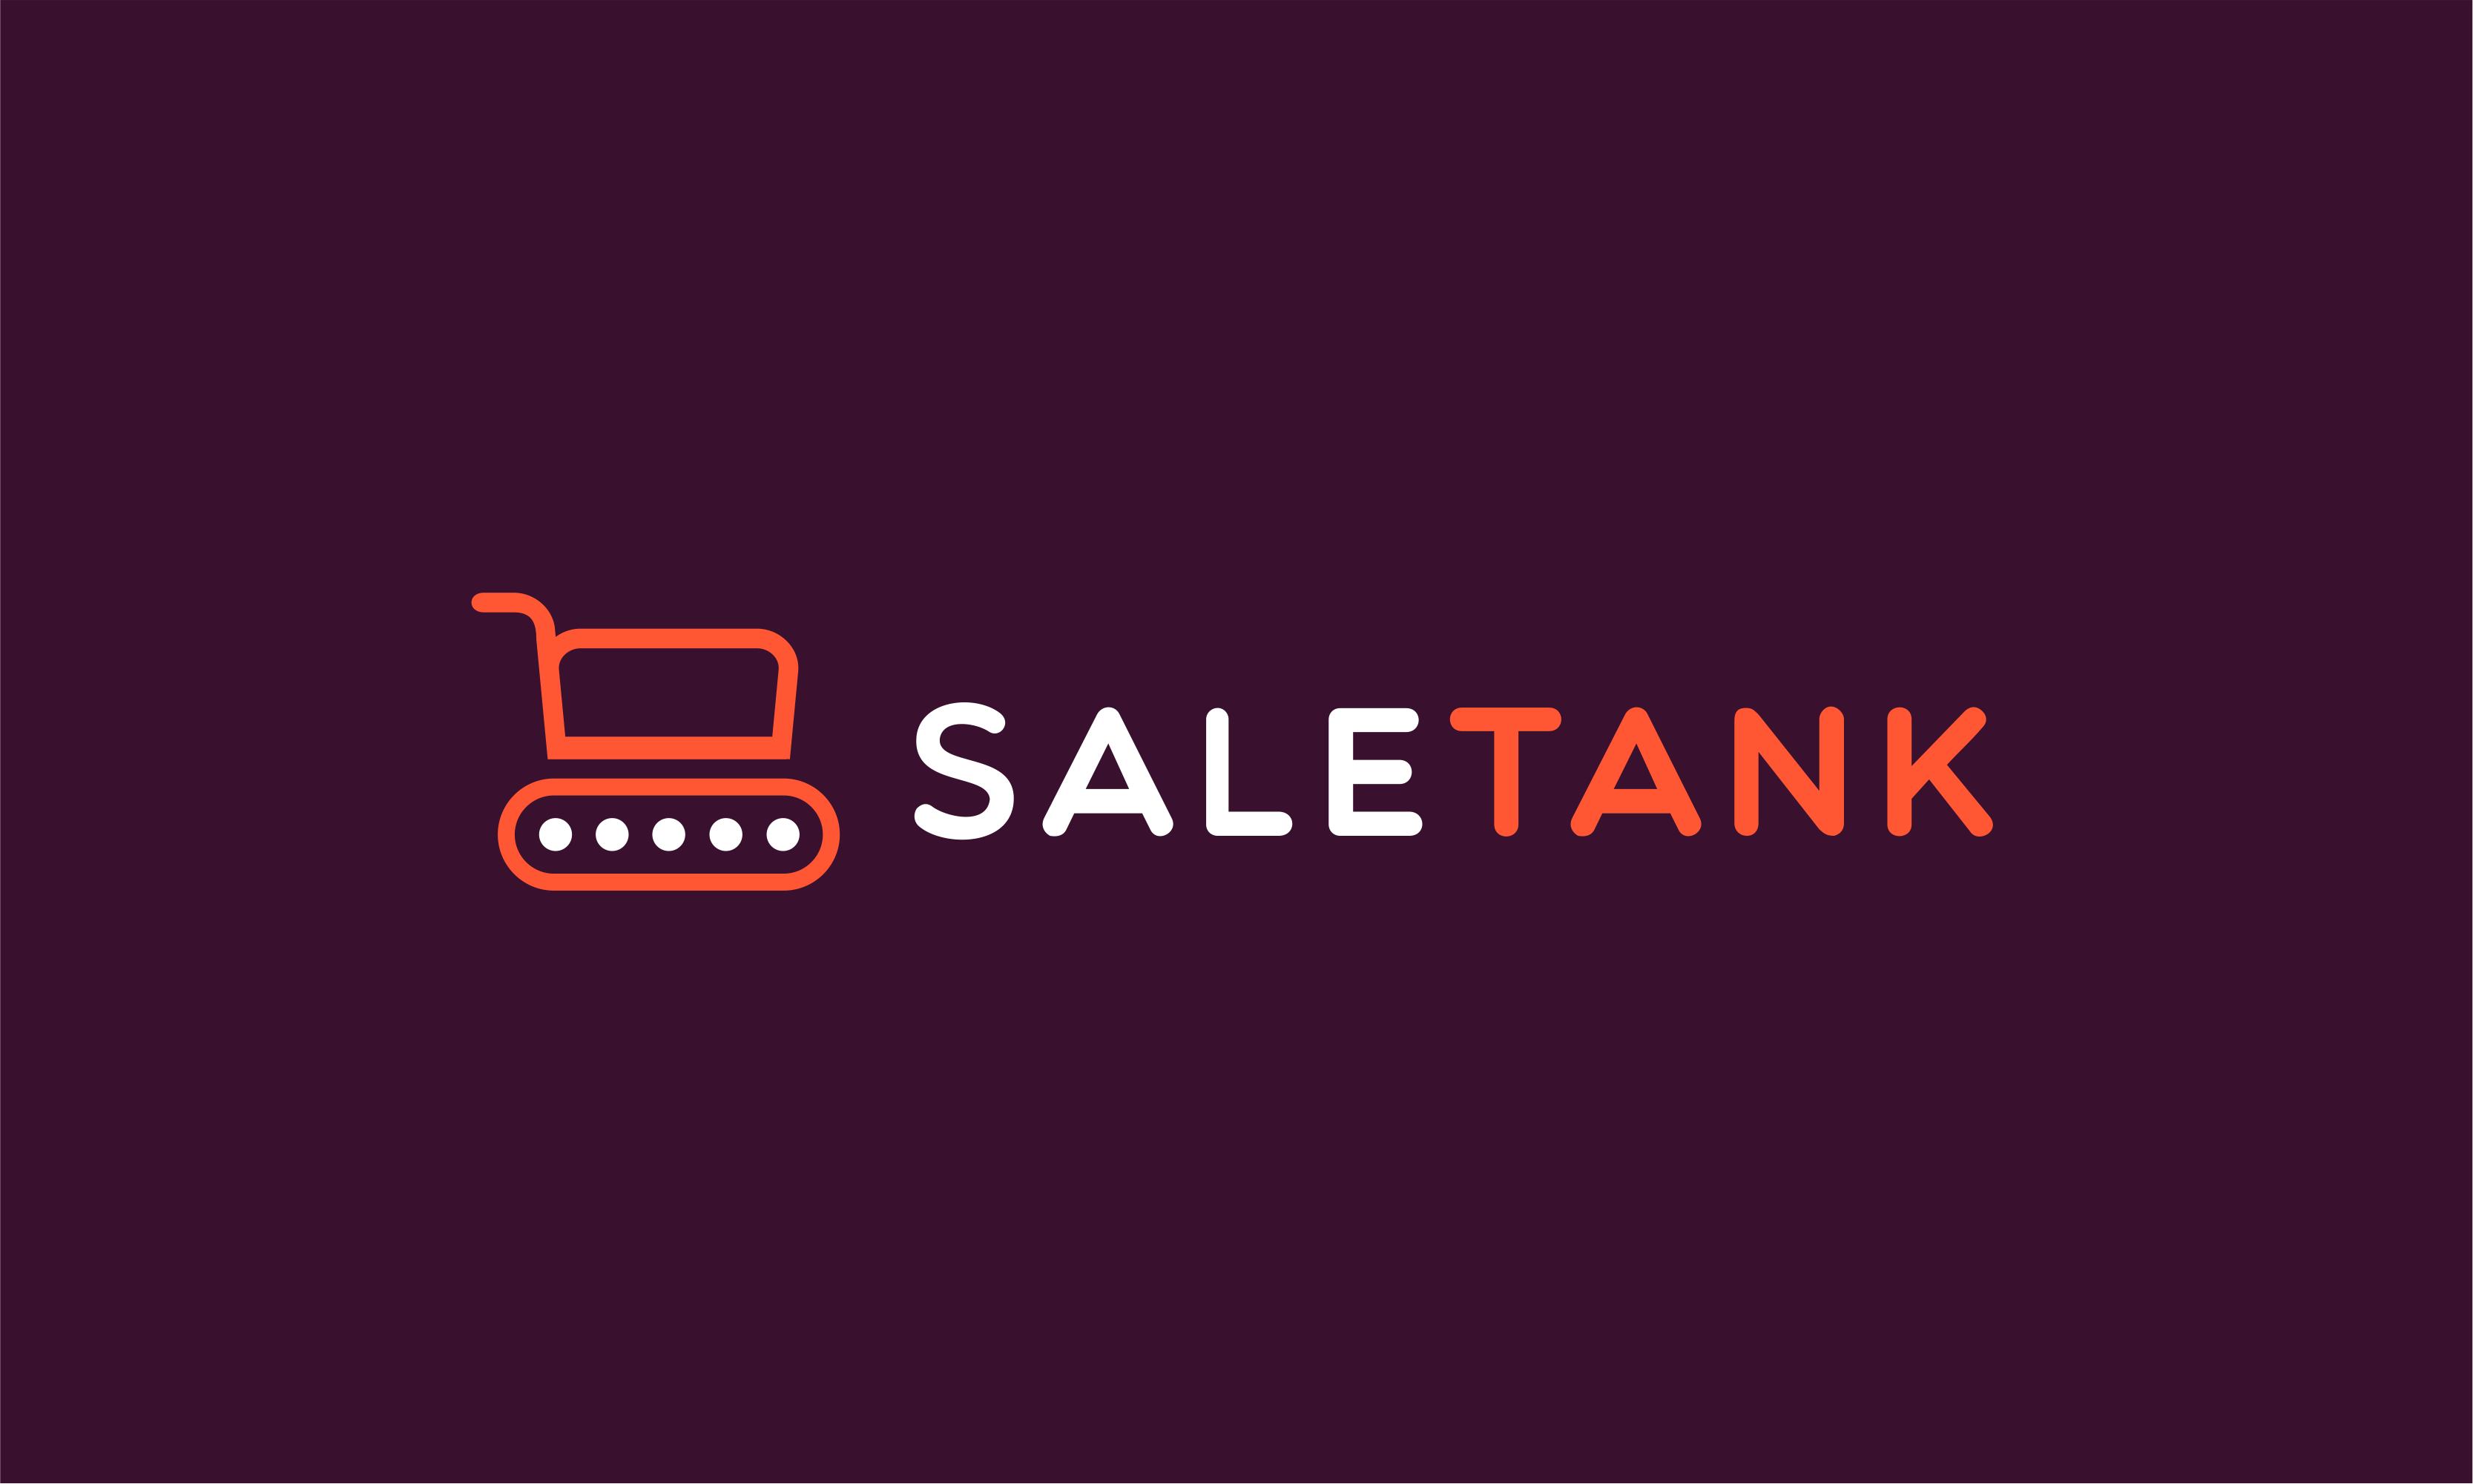 Saletank